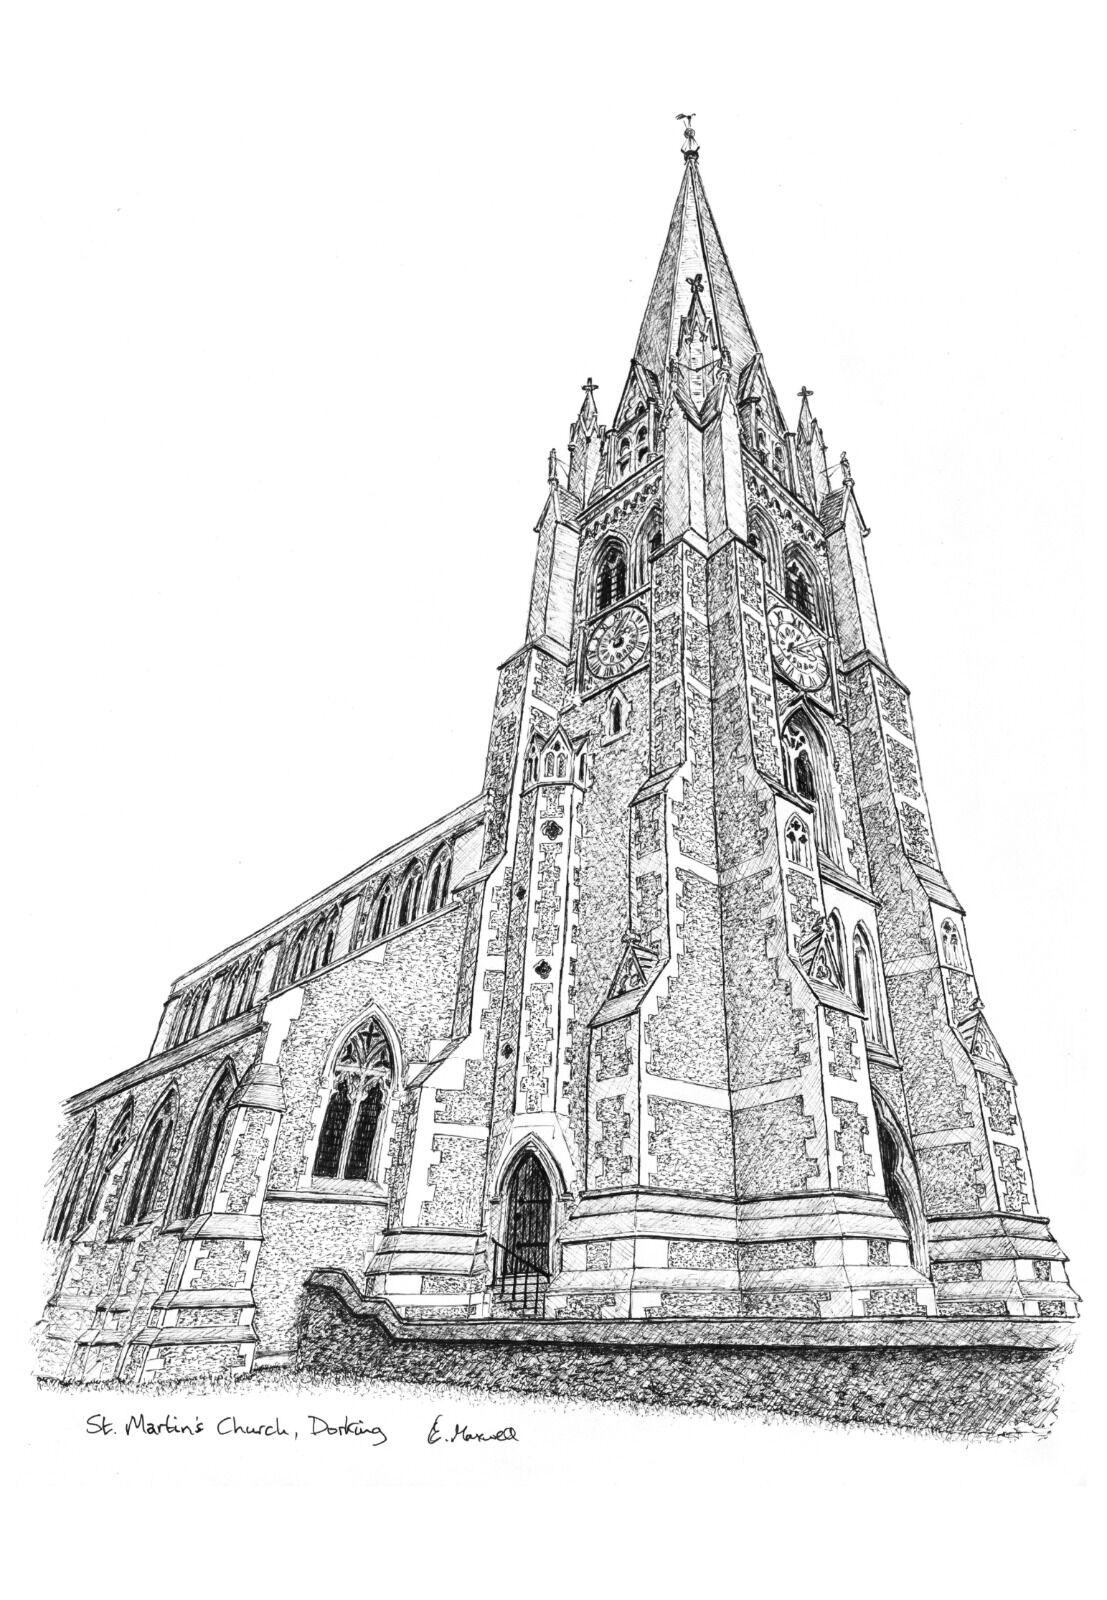 St Martins Church, Dorking